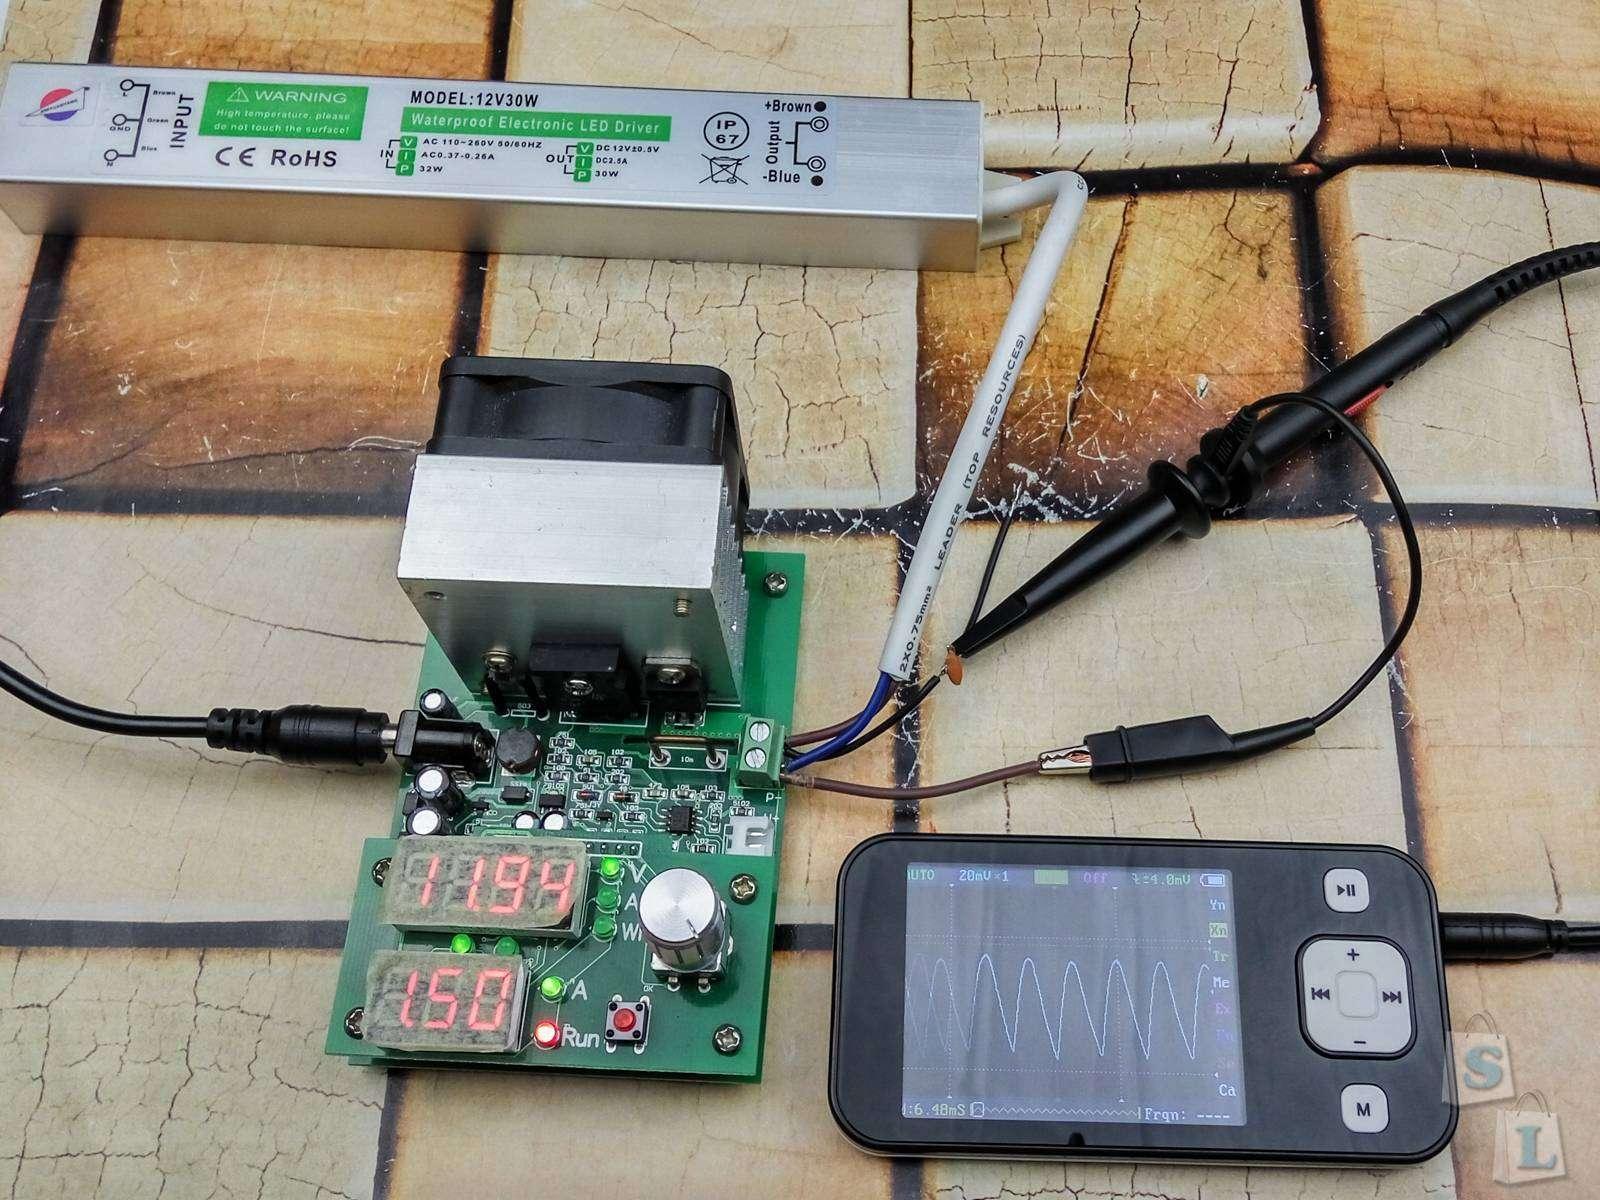 GearBest: Обзор и тестирование блока питания для LED FS-12V-30W 12V / 2.5A IP67